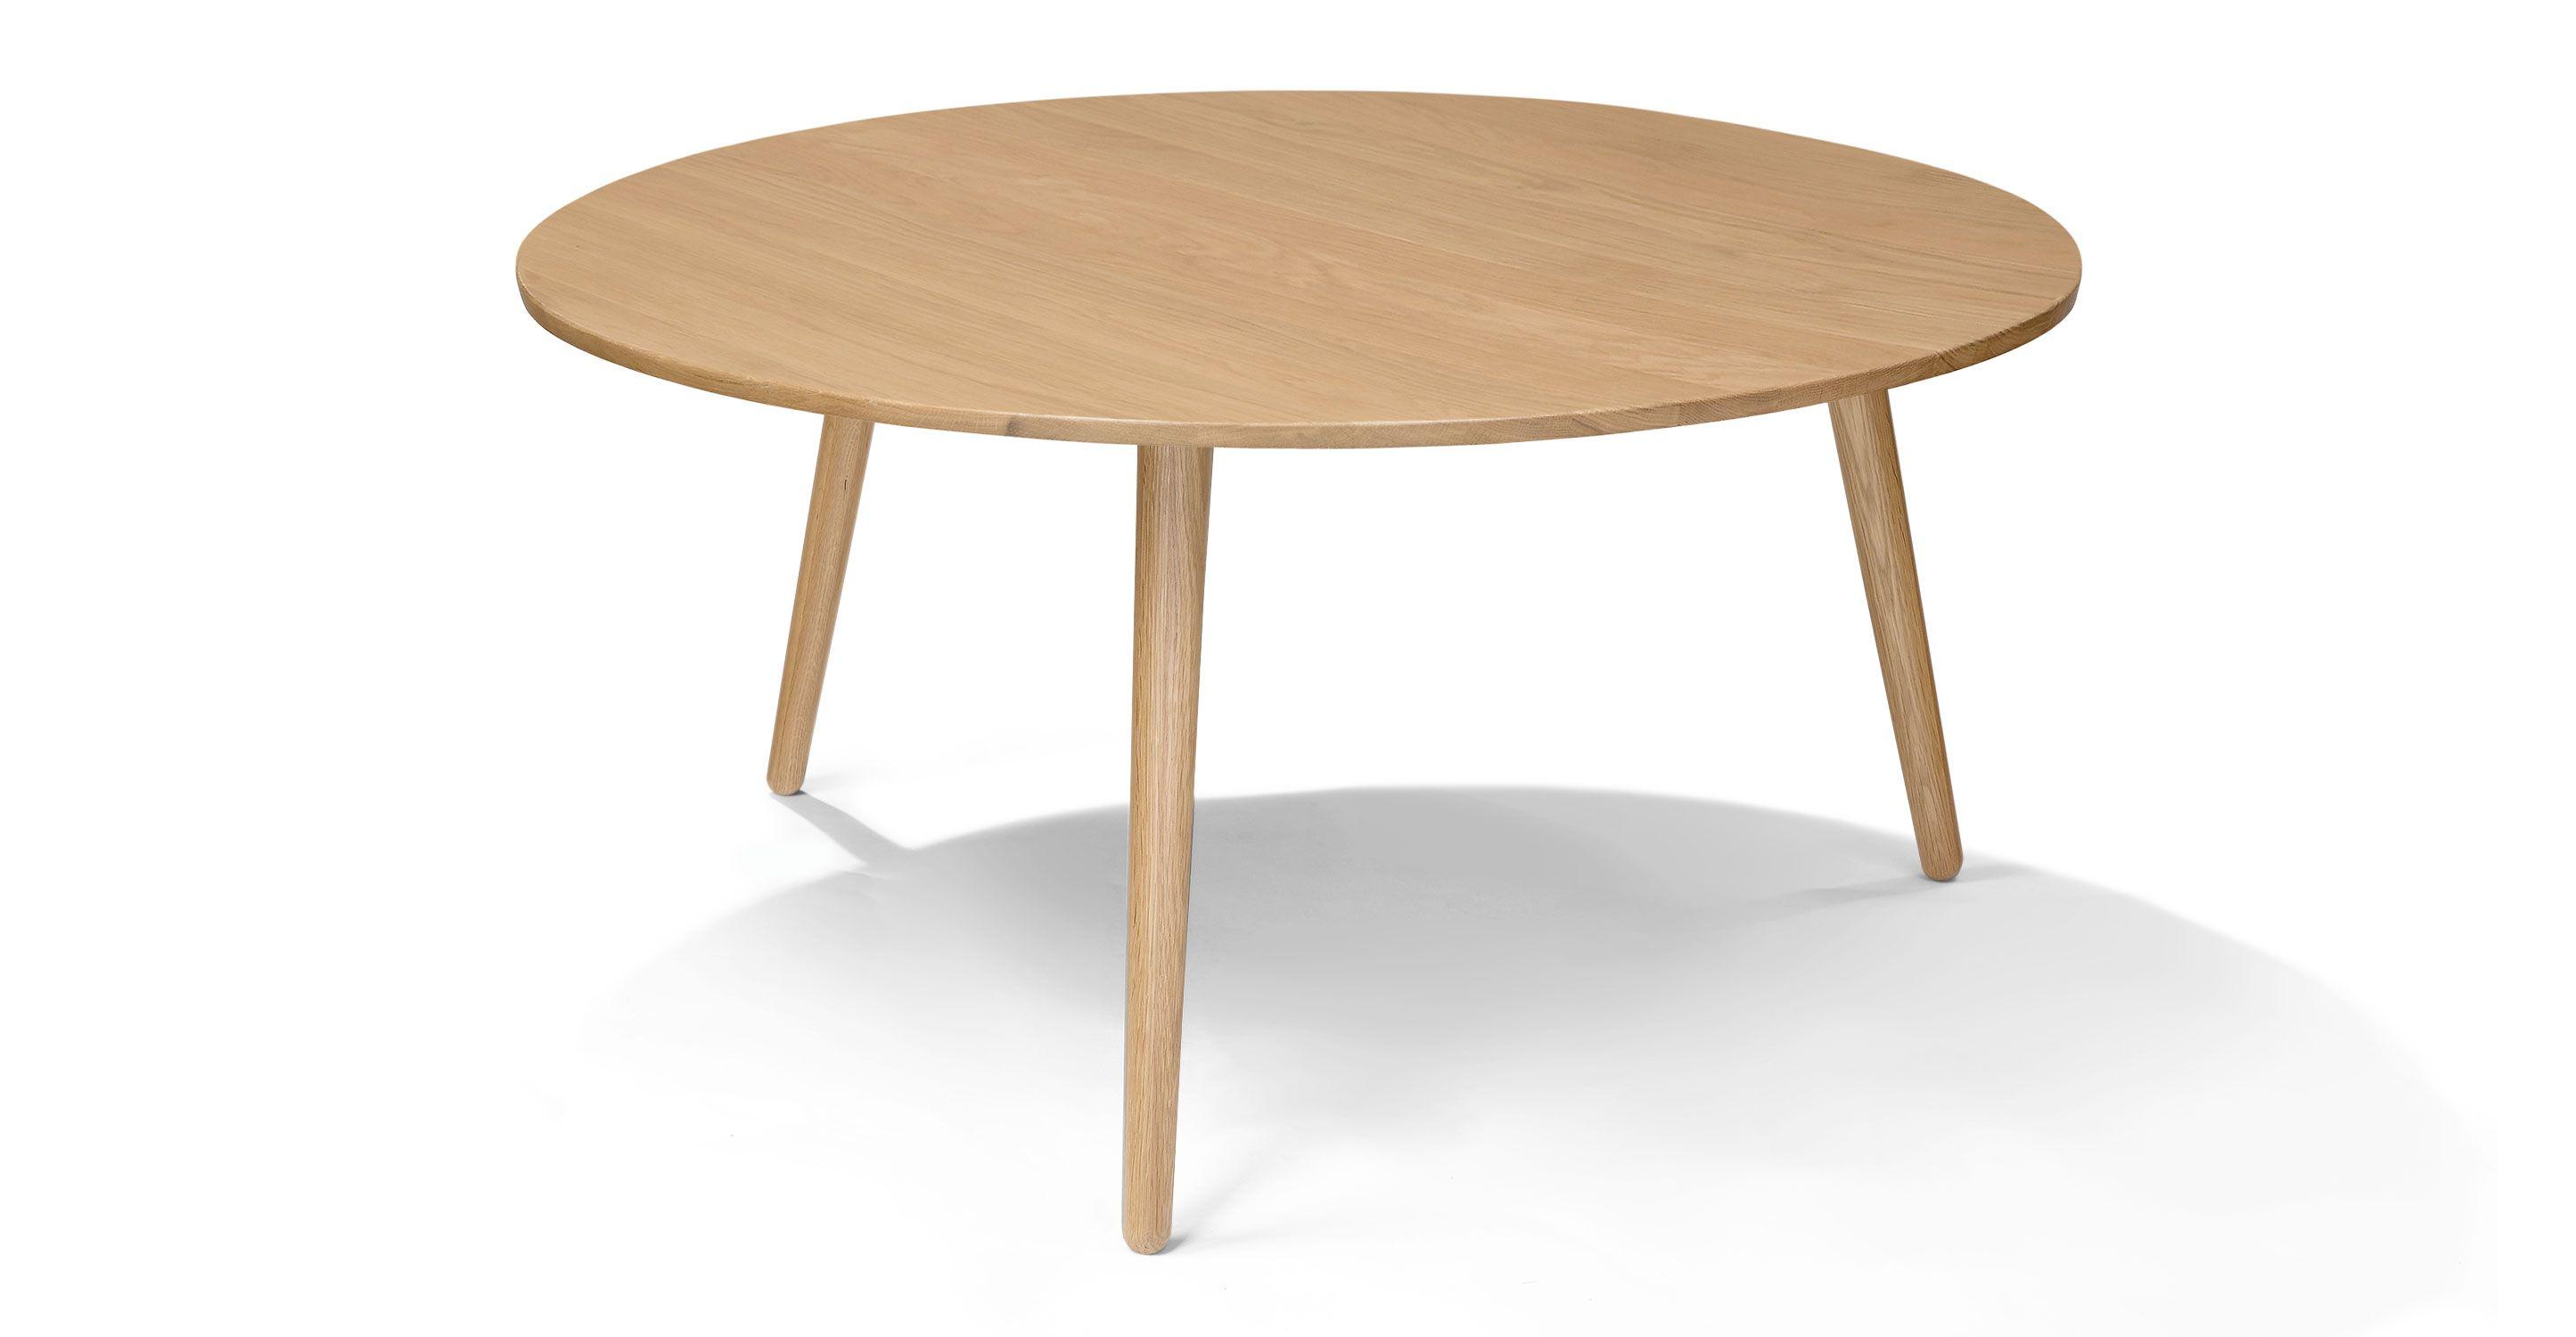 Amoeba Wild Oak Coffee Table Coffee Tables Bryght Modern Mid Century And Scandina Mid Century Modern Coffee Table Scandinavian Coffee Table Coffee Table [ 1500 x 2890 Pixel ]